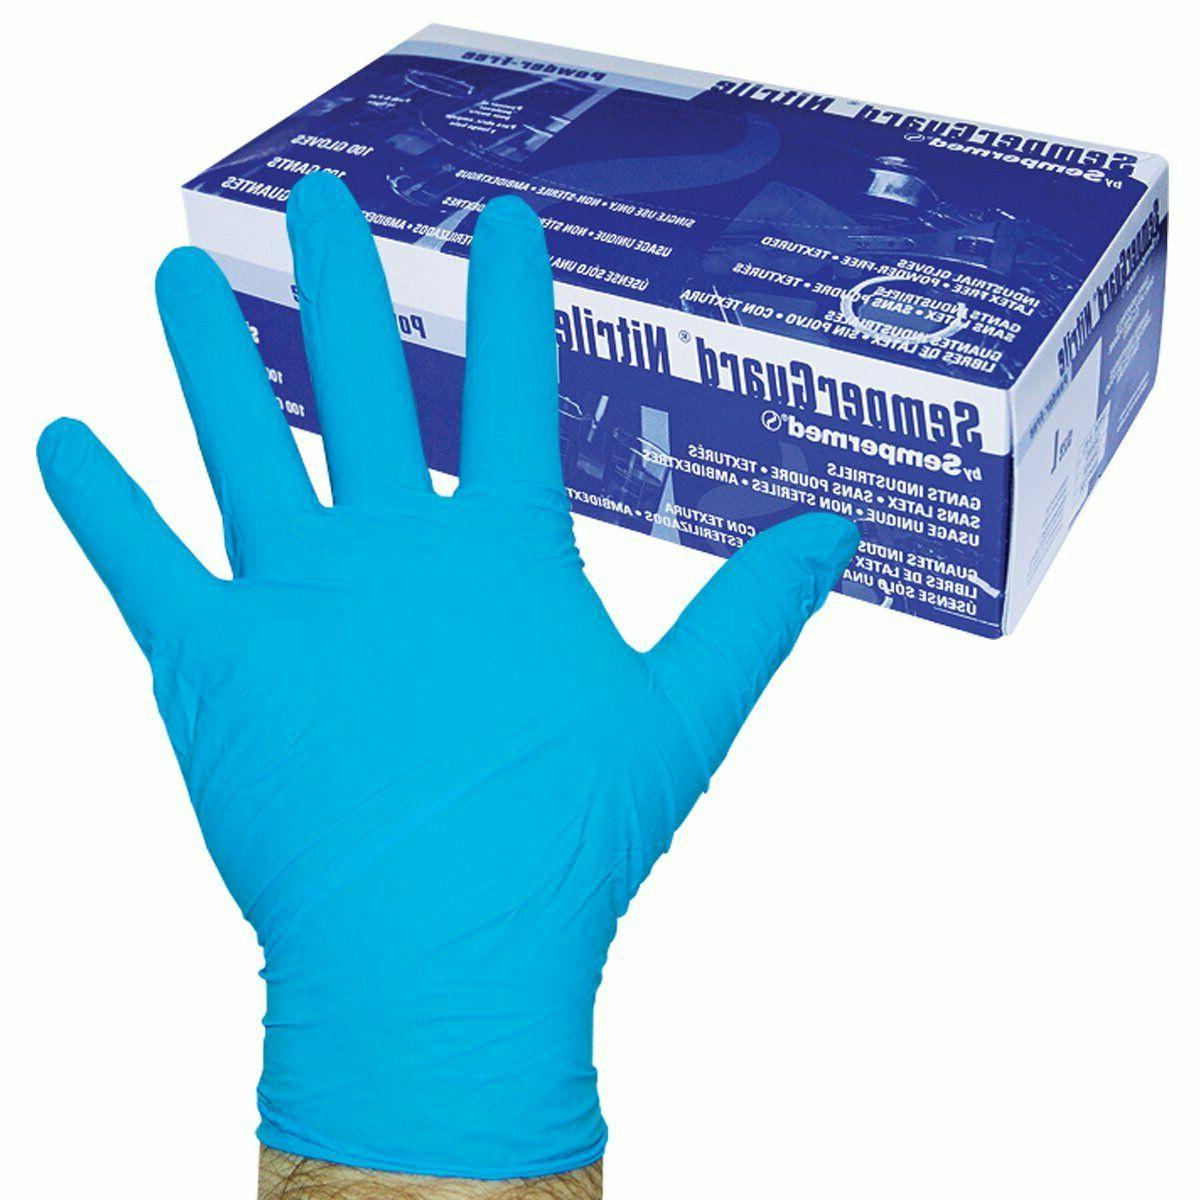 100 Pcs Nitrile Gloves Medium Blue Sterile Lab Safety Dispos